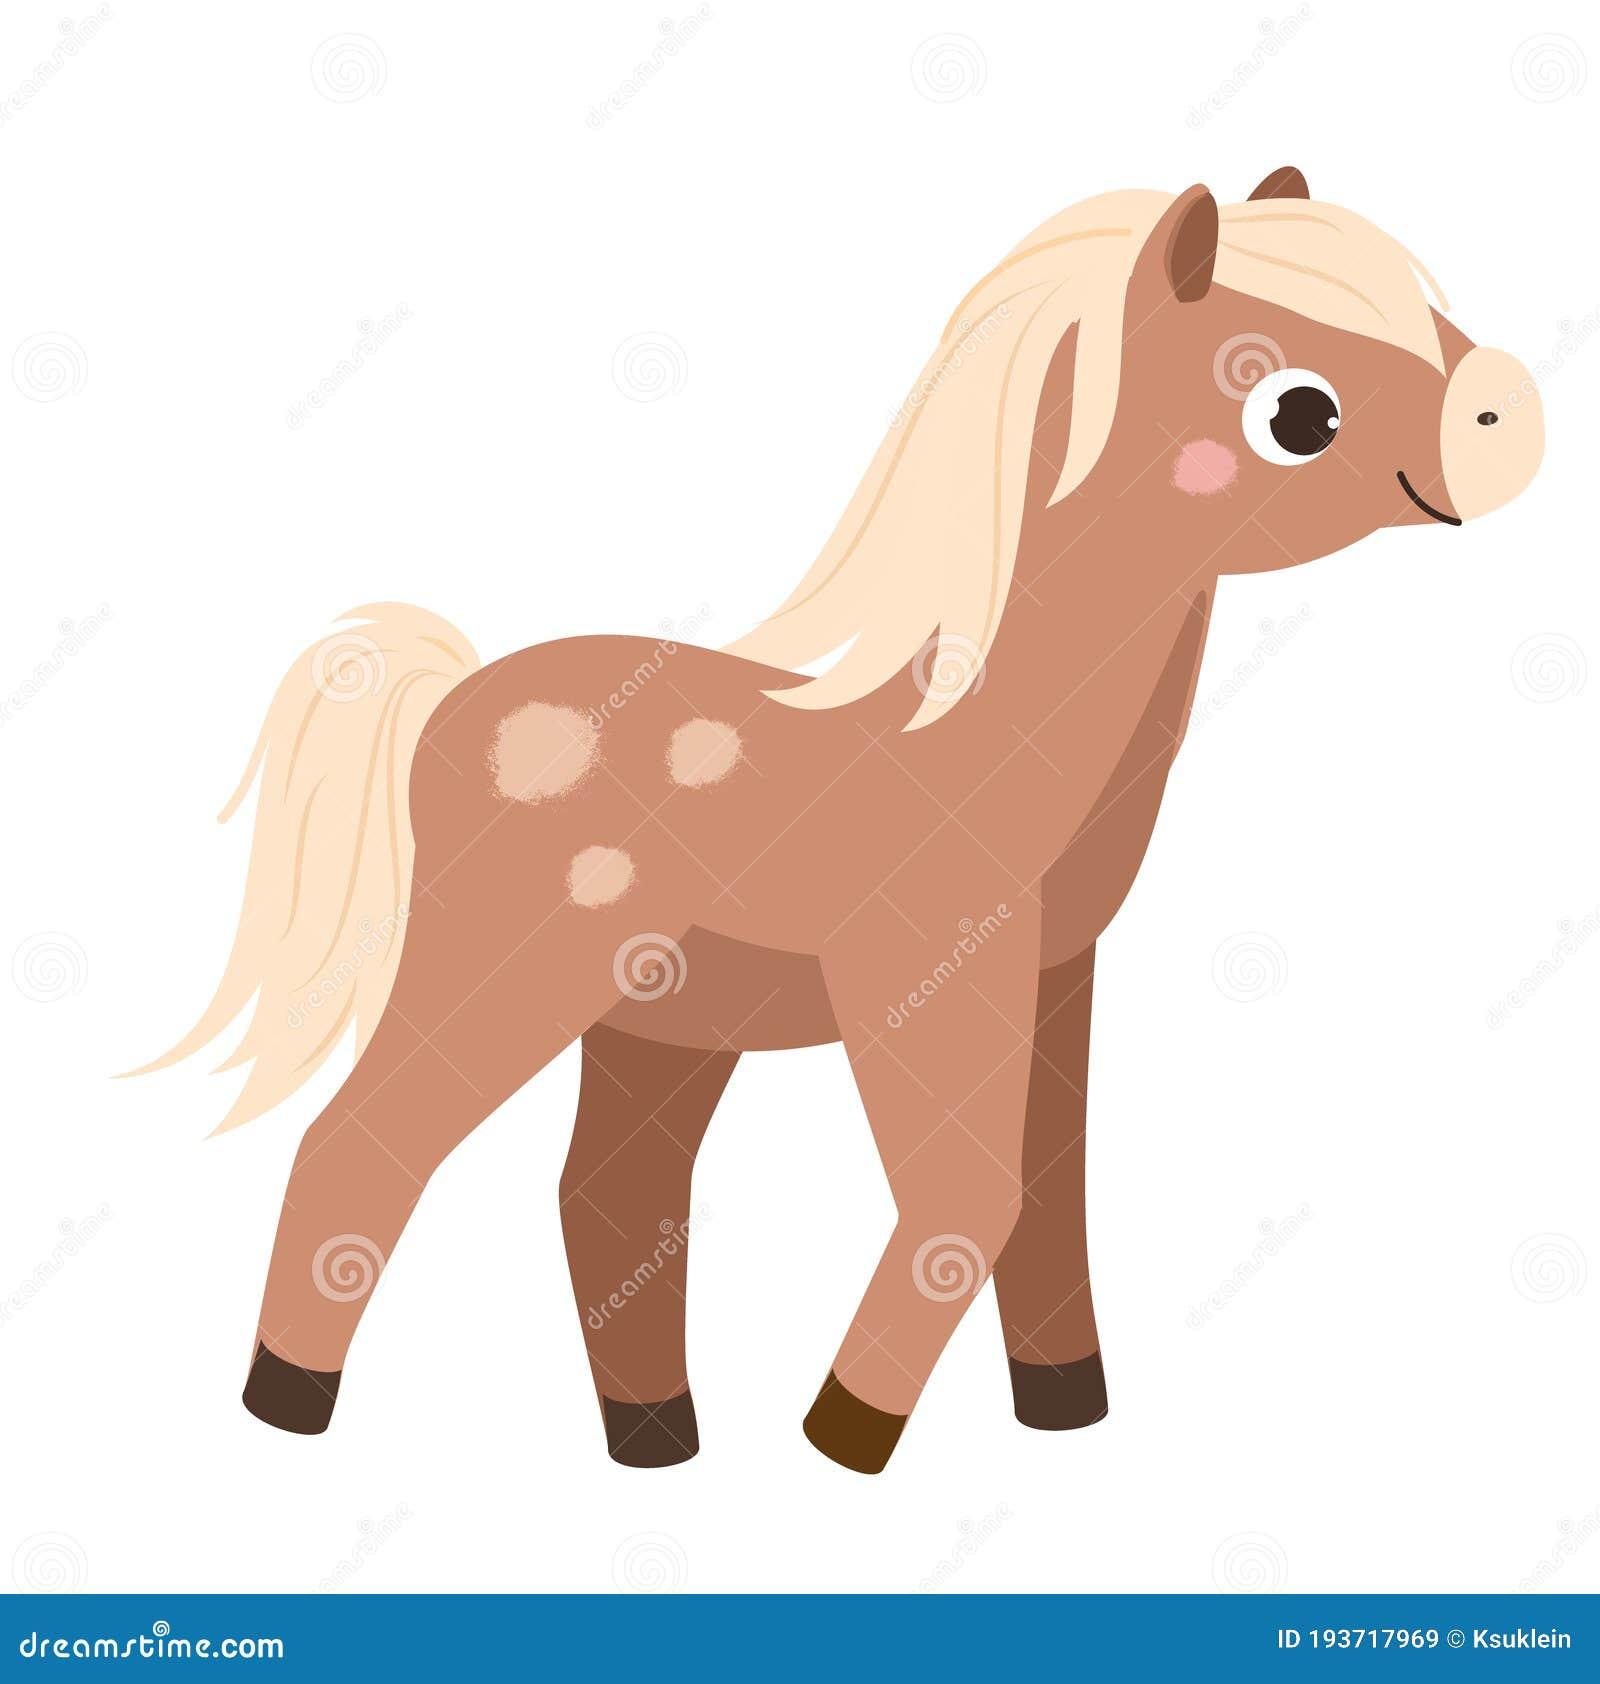 Cartoon Horse Cute Farm Animal Character Vector Clip Art Stock Vector Illustration Of Funny Brown 193717969